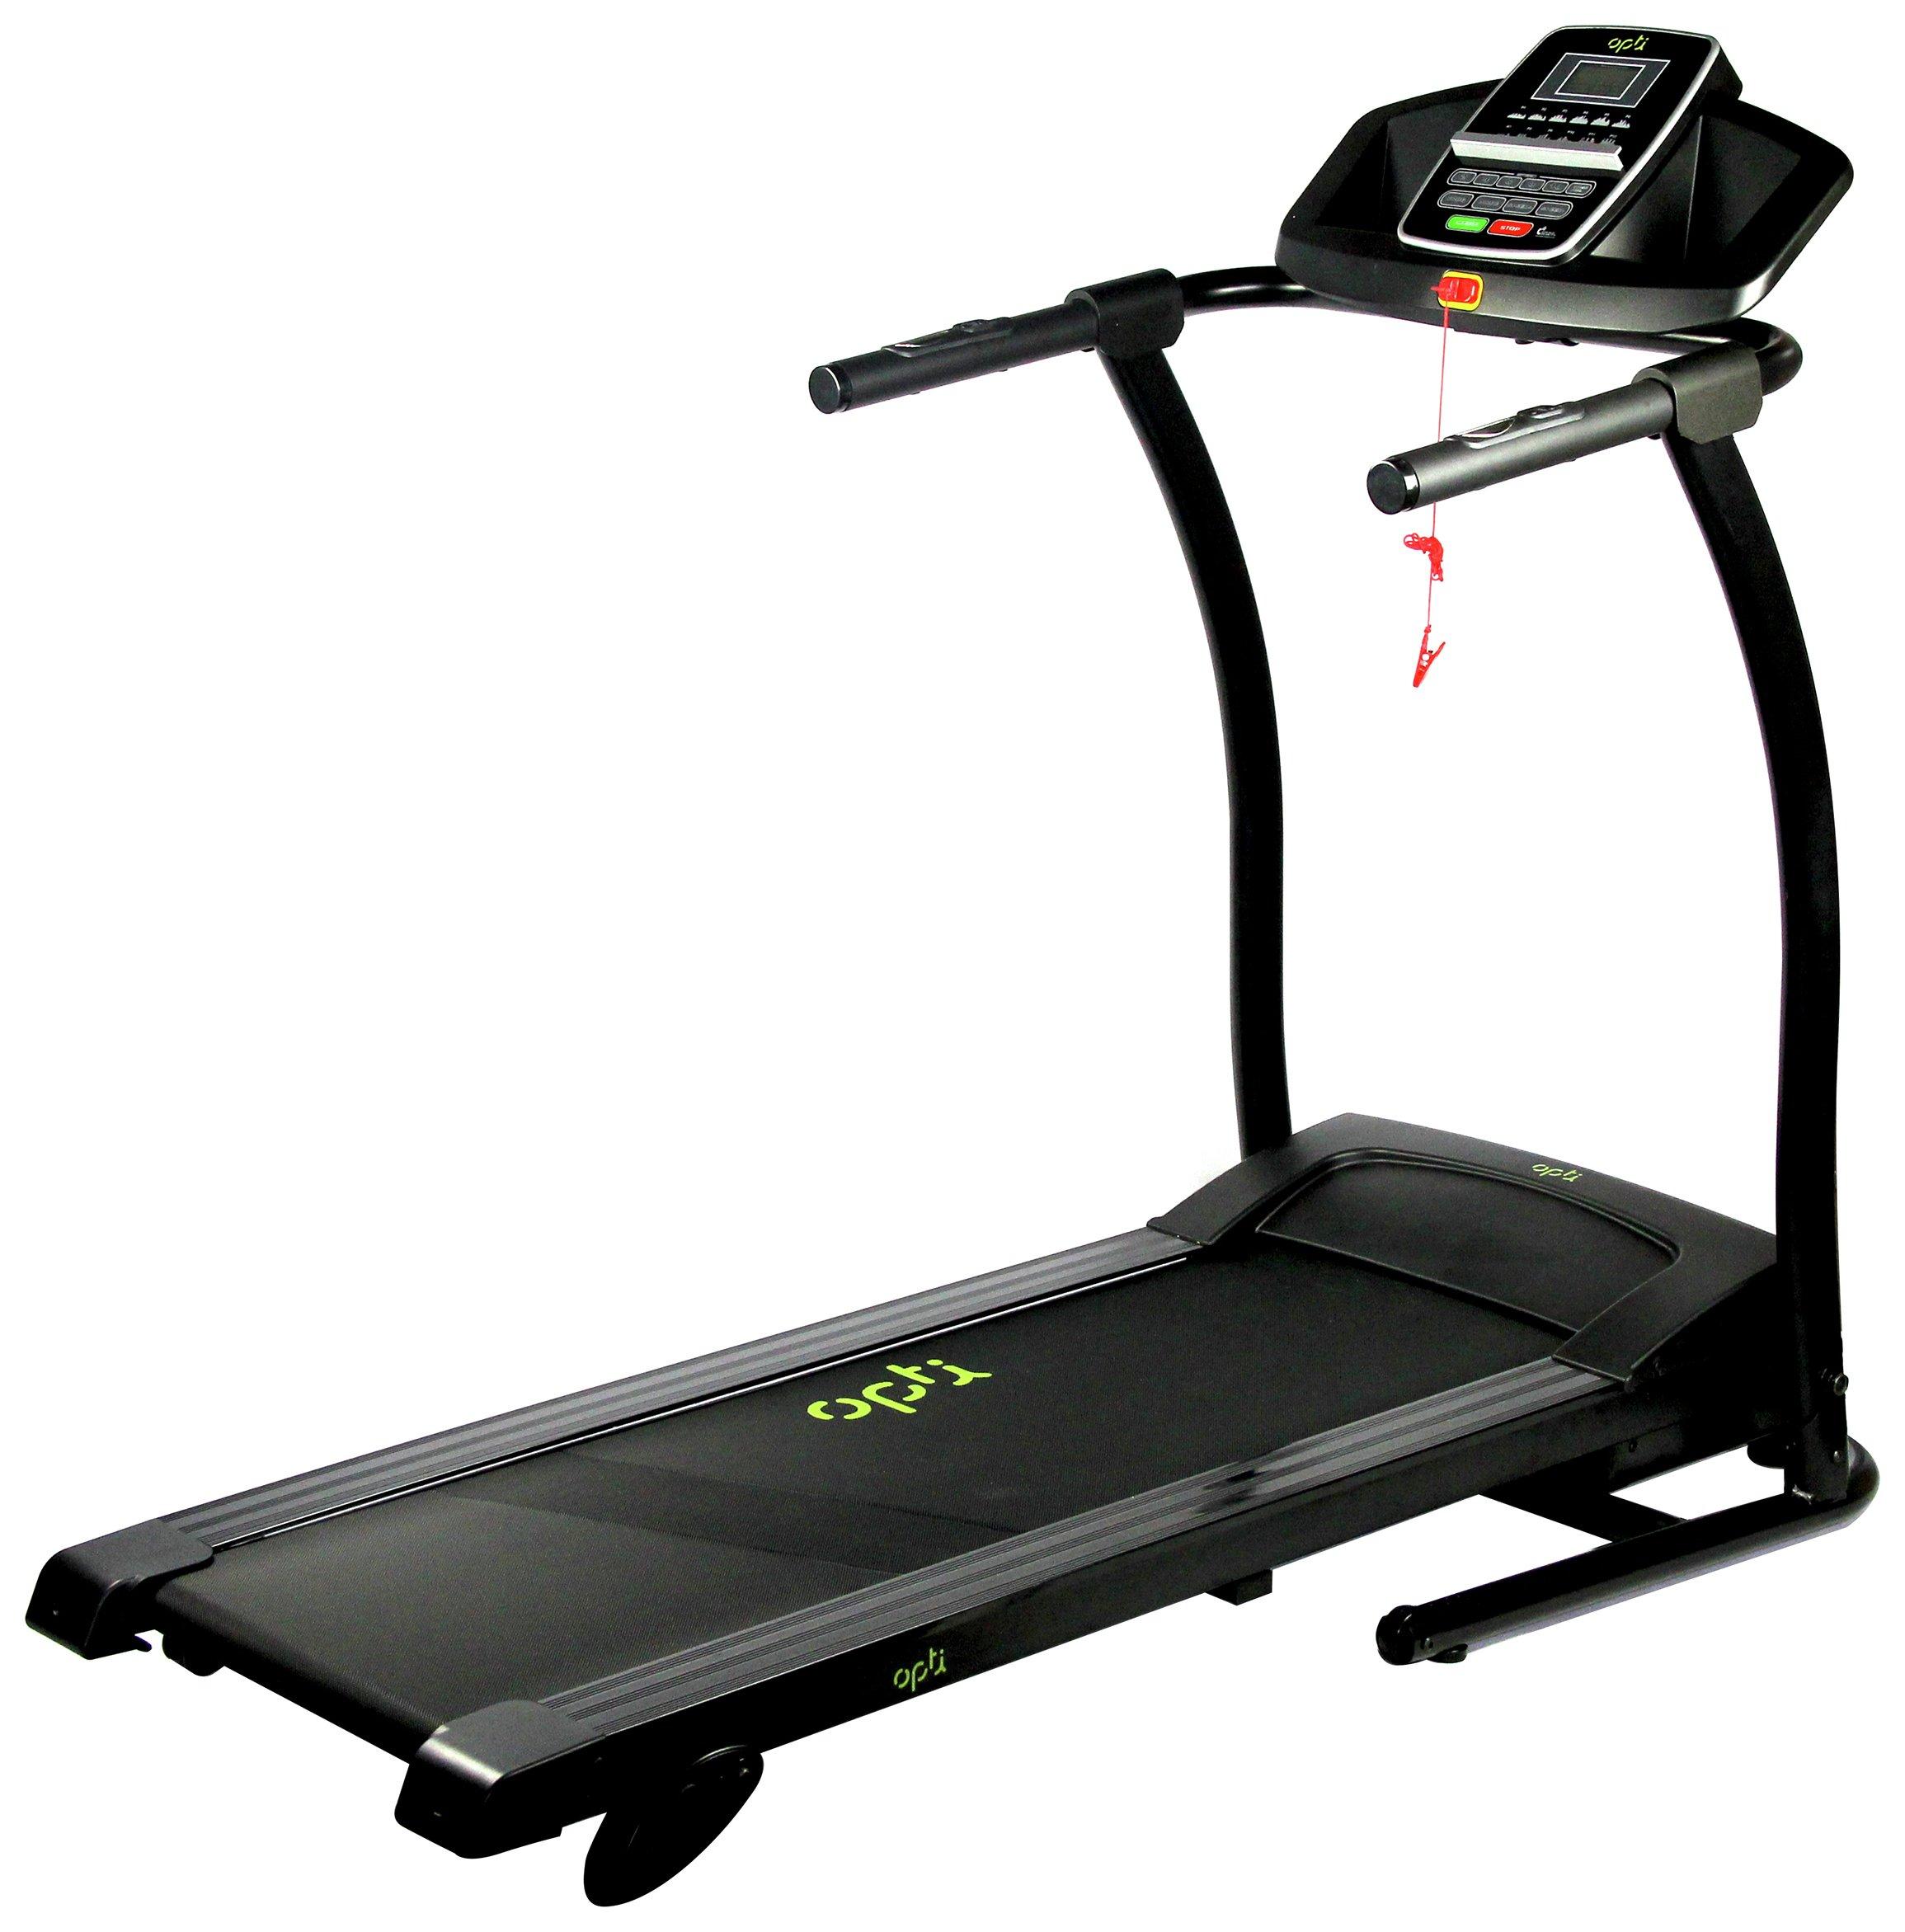 Opti Folding Treadmill Speed 12kph - £256.94 delivered @ Argos (selected postcodes)